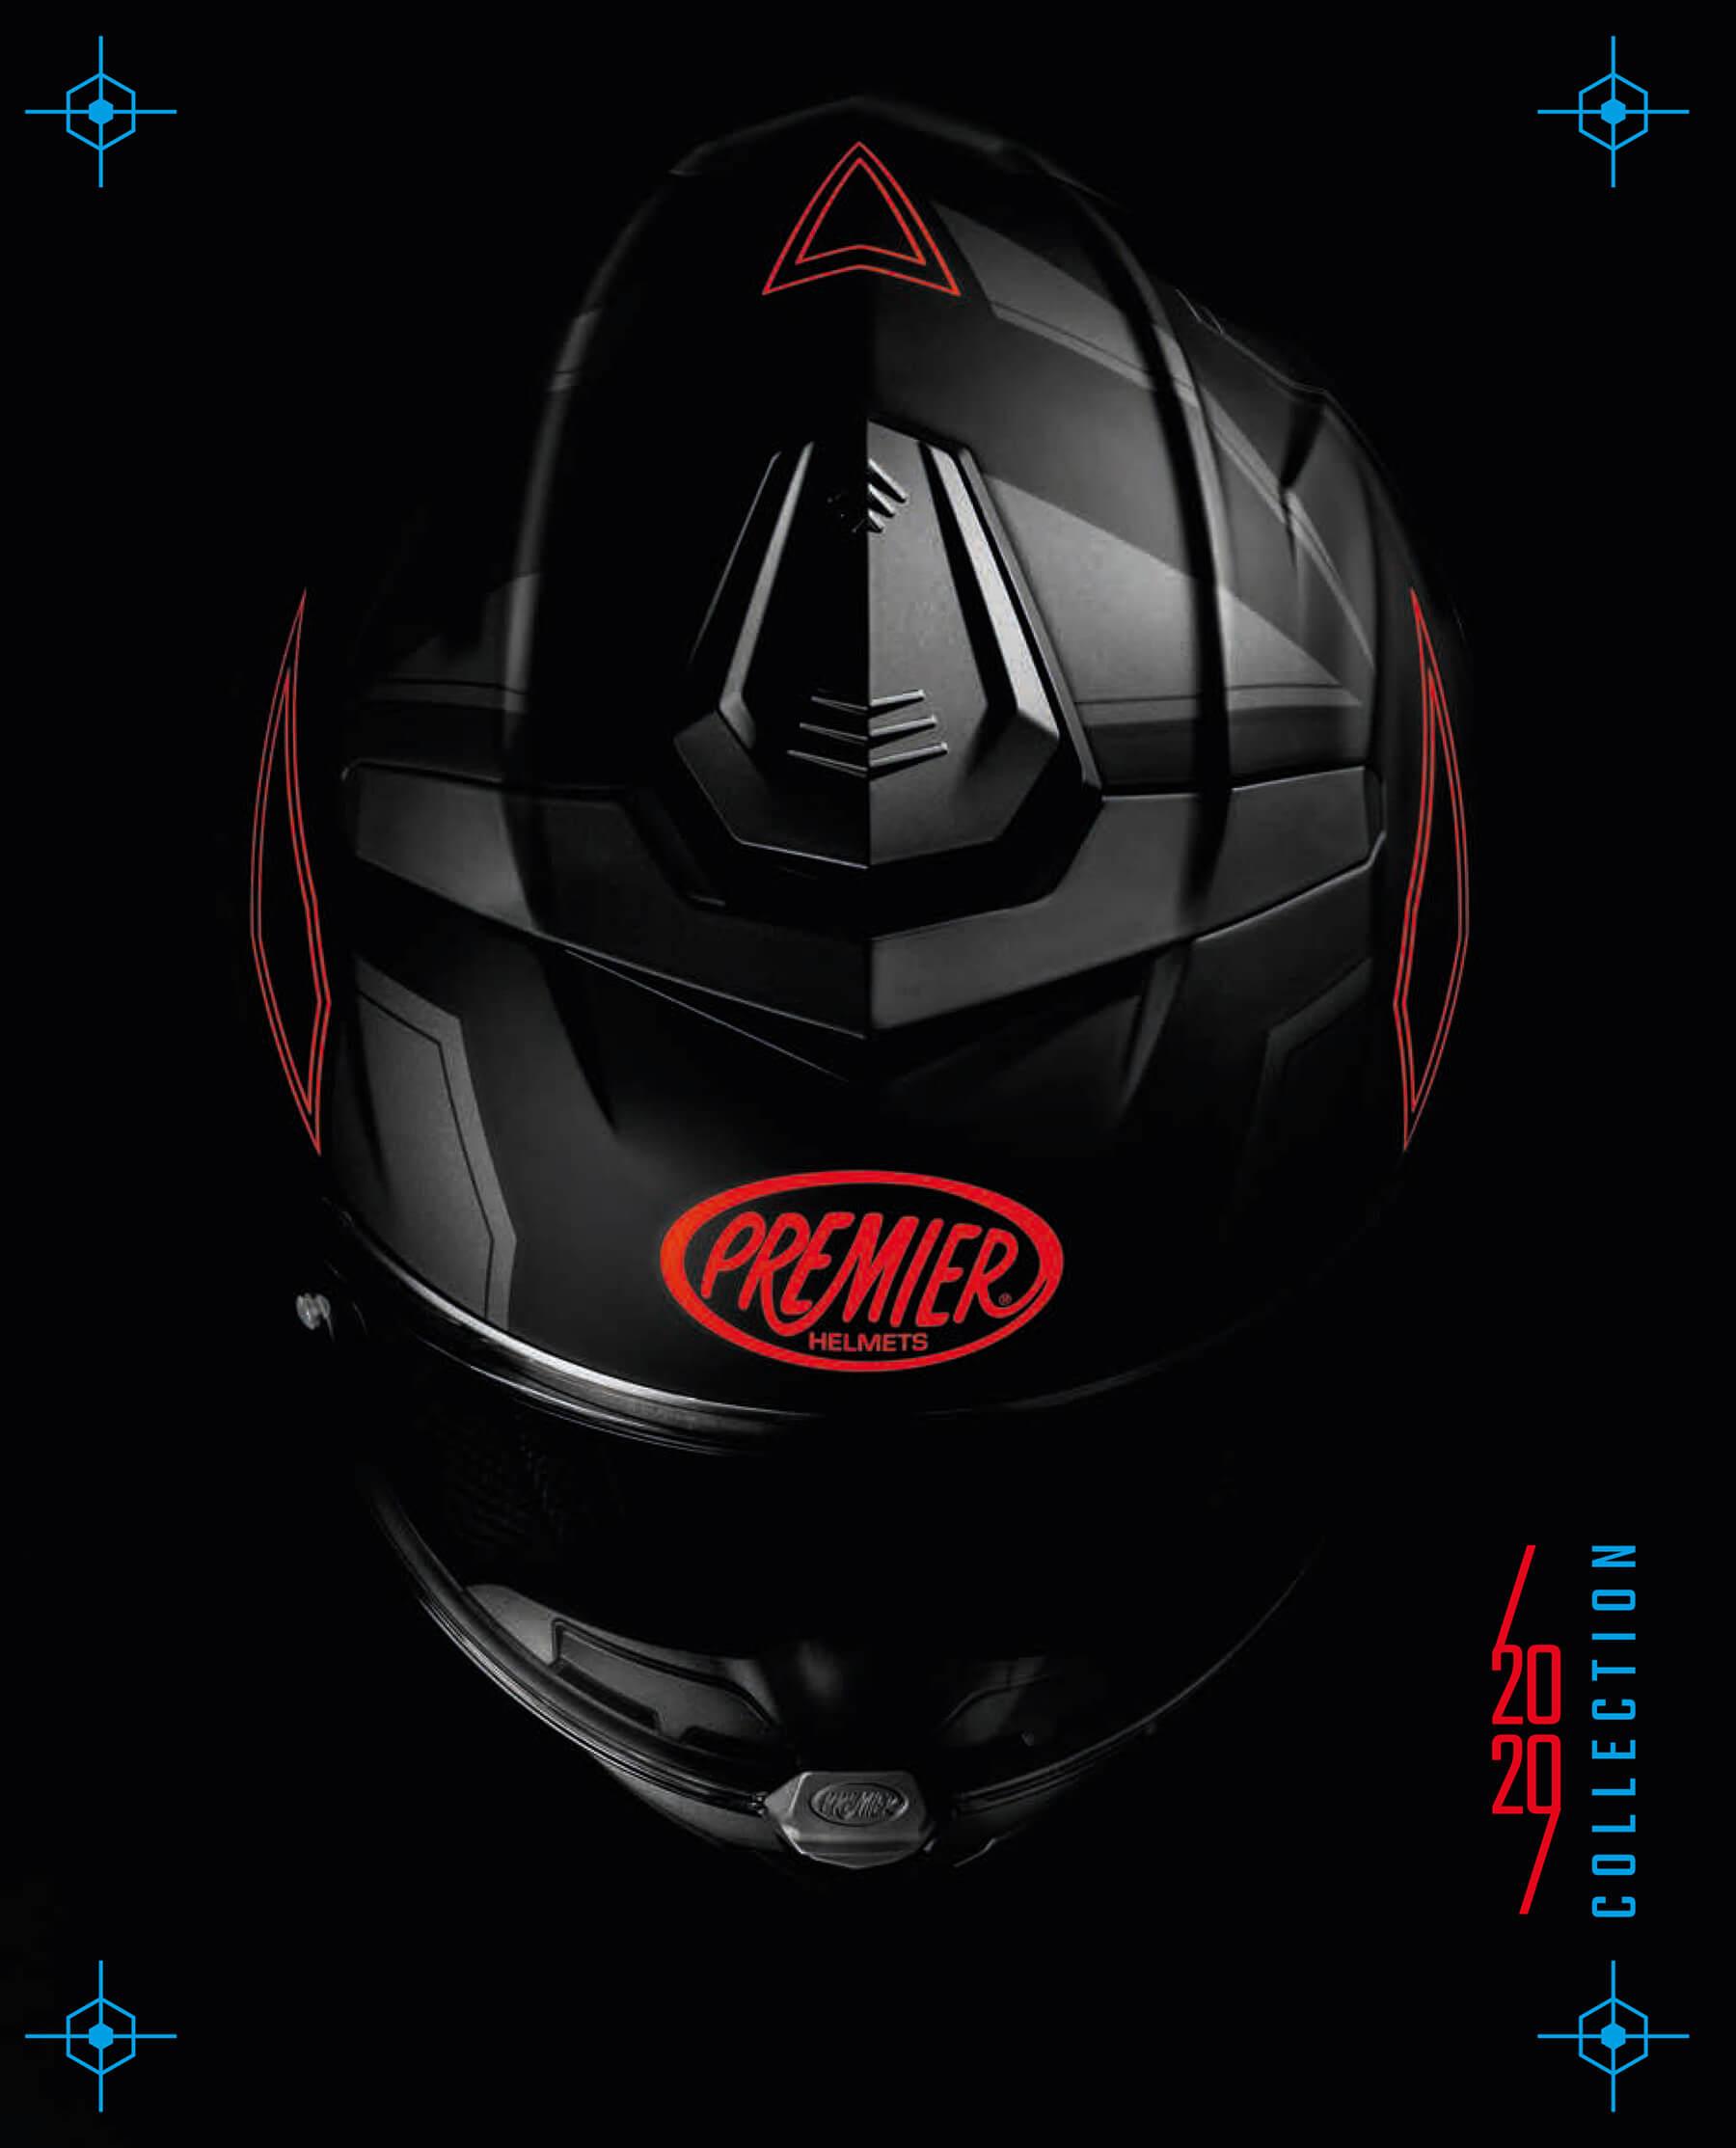 PREMIER_catalogo 2020-copertina